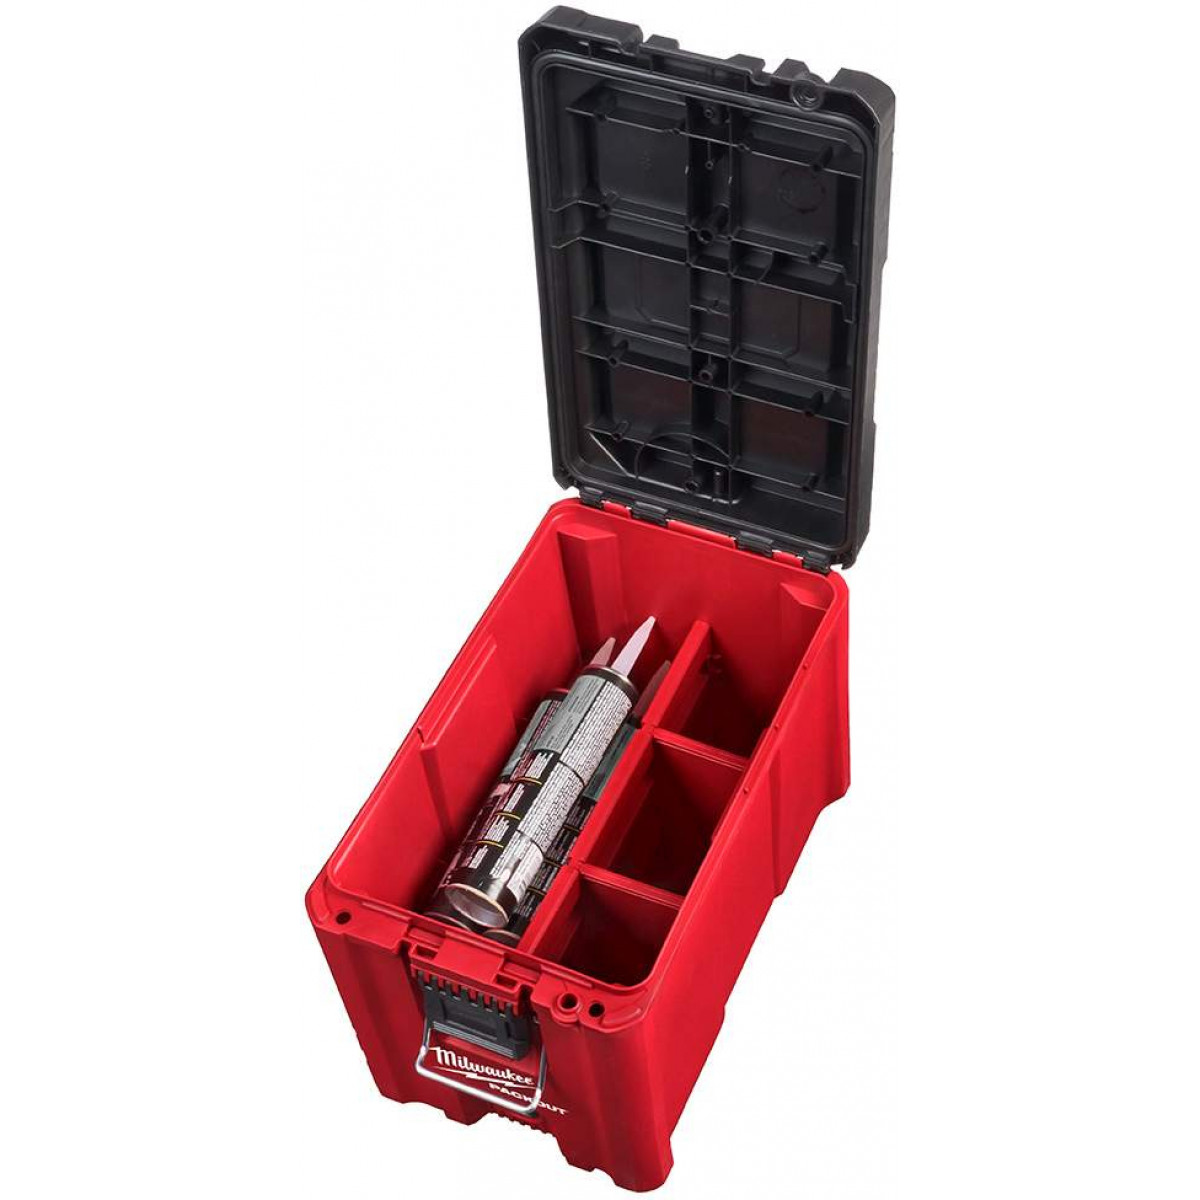 Milwaukee 48-22-8422 PACKOUT Compact Tool Box